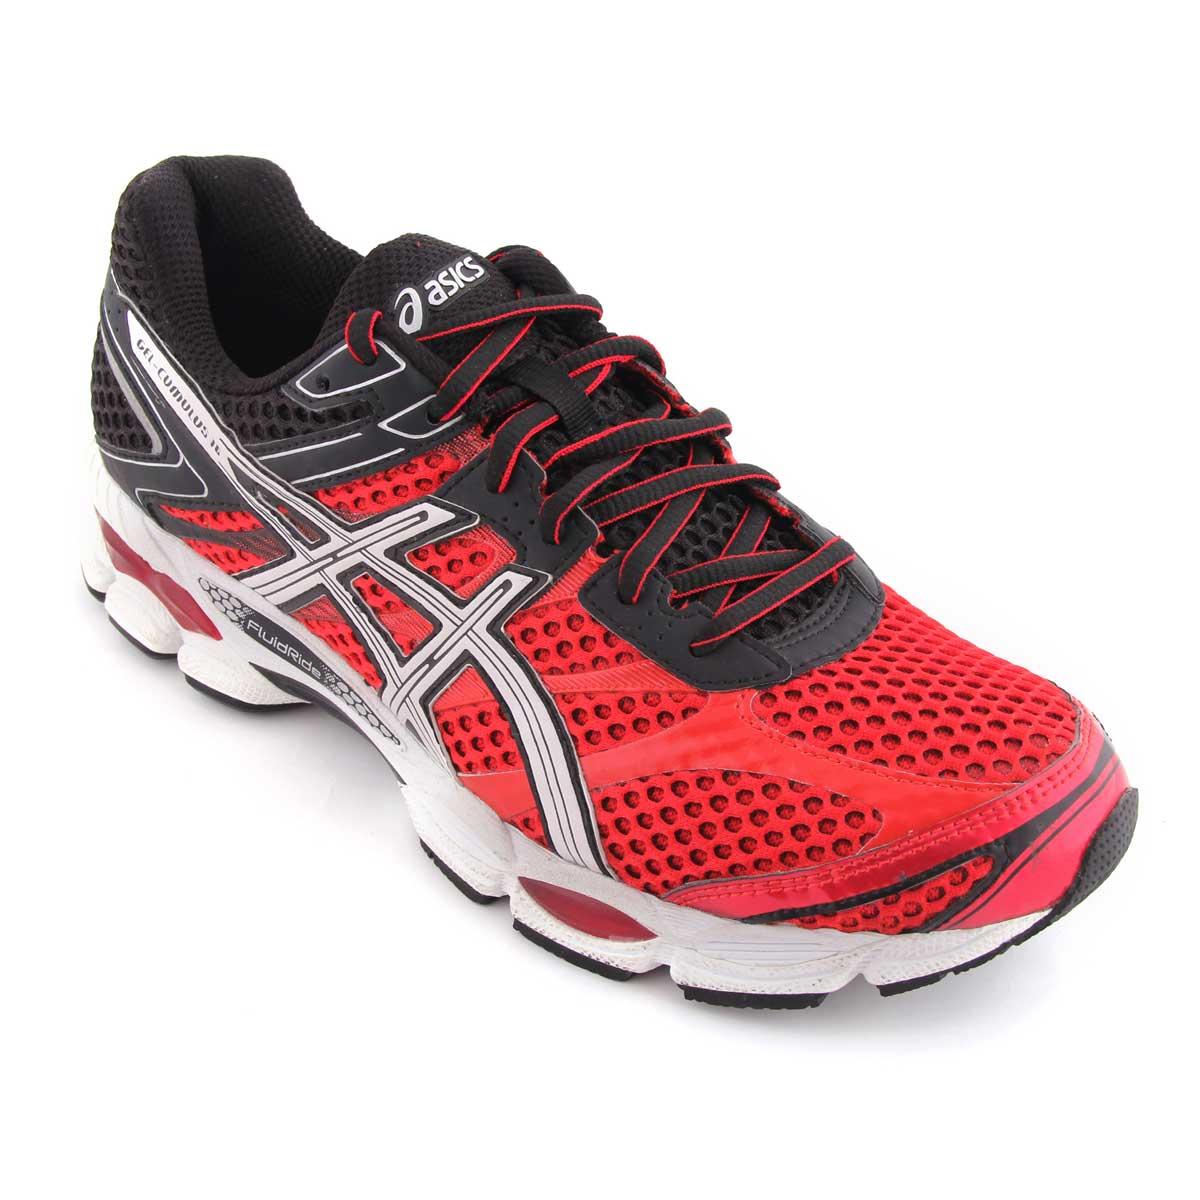 Running Shoes, Running, Buy, Asics, Asics Gel-Cumulus 16 Running Shoes  (Chinese Red/Black)